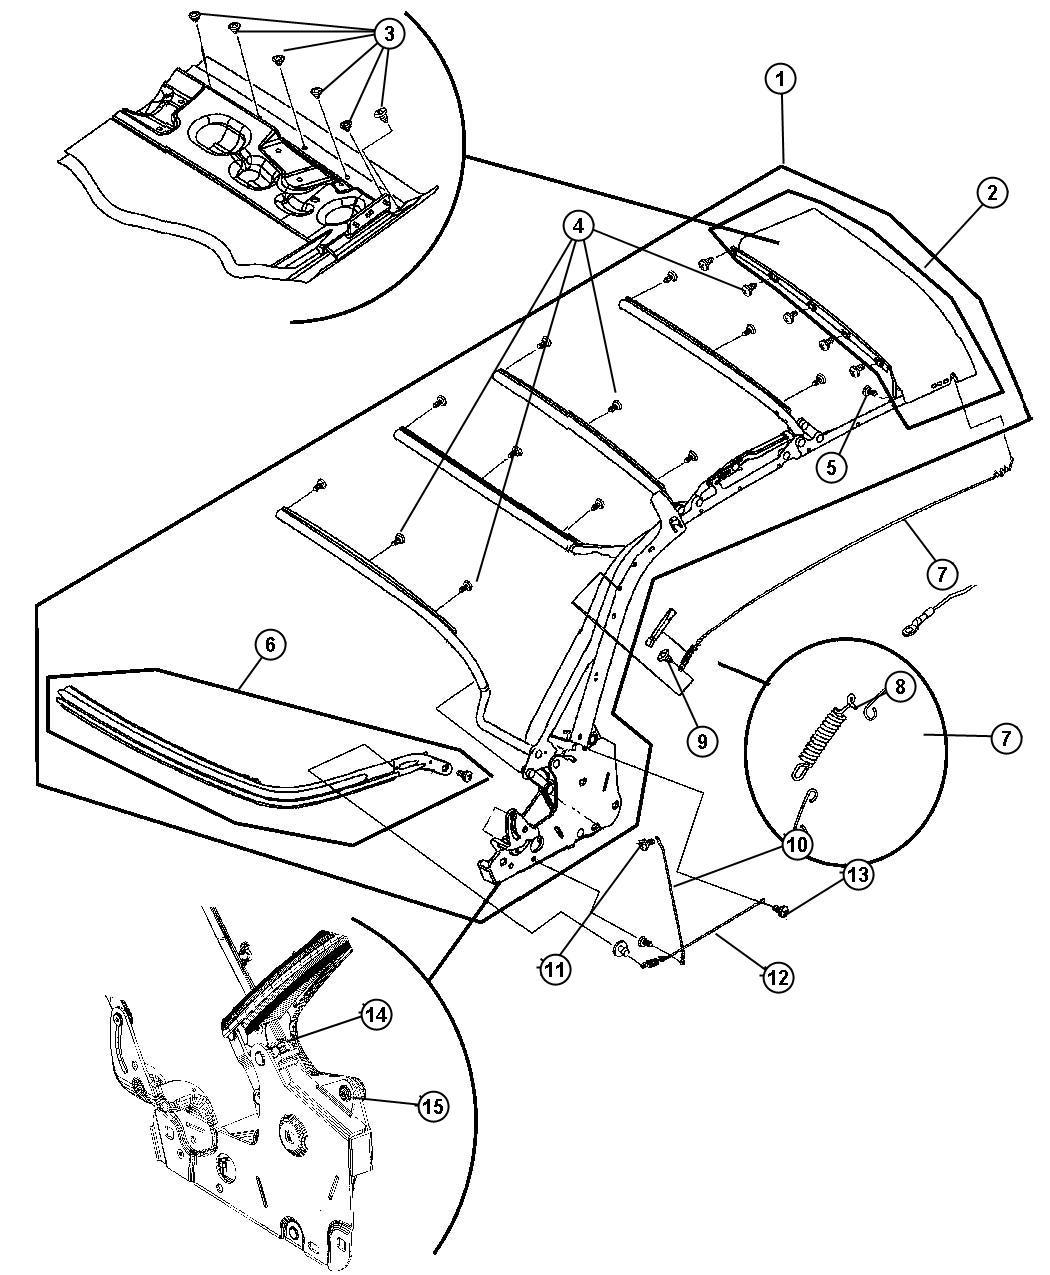 Chrysler Pt Cruiser Header Folding Top Latches